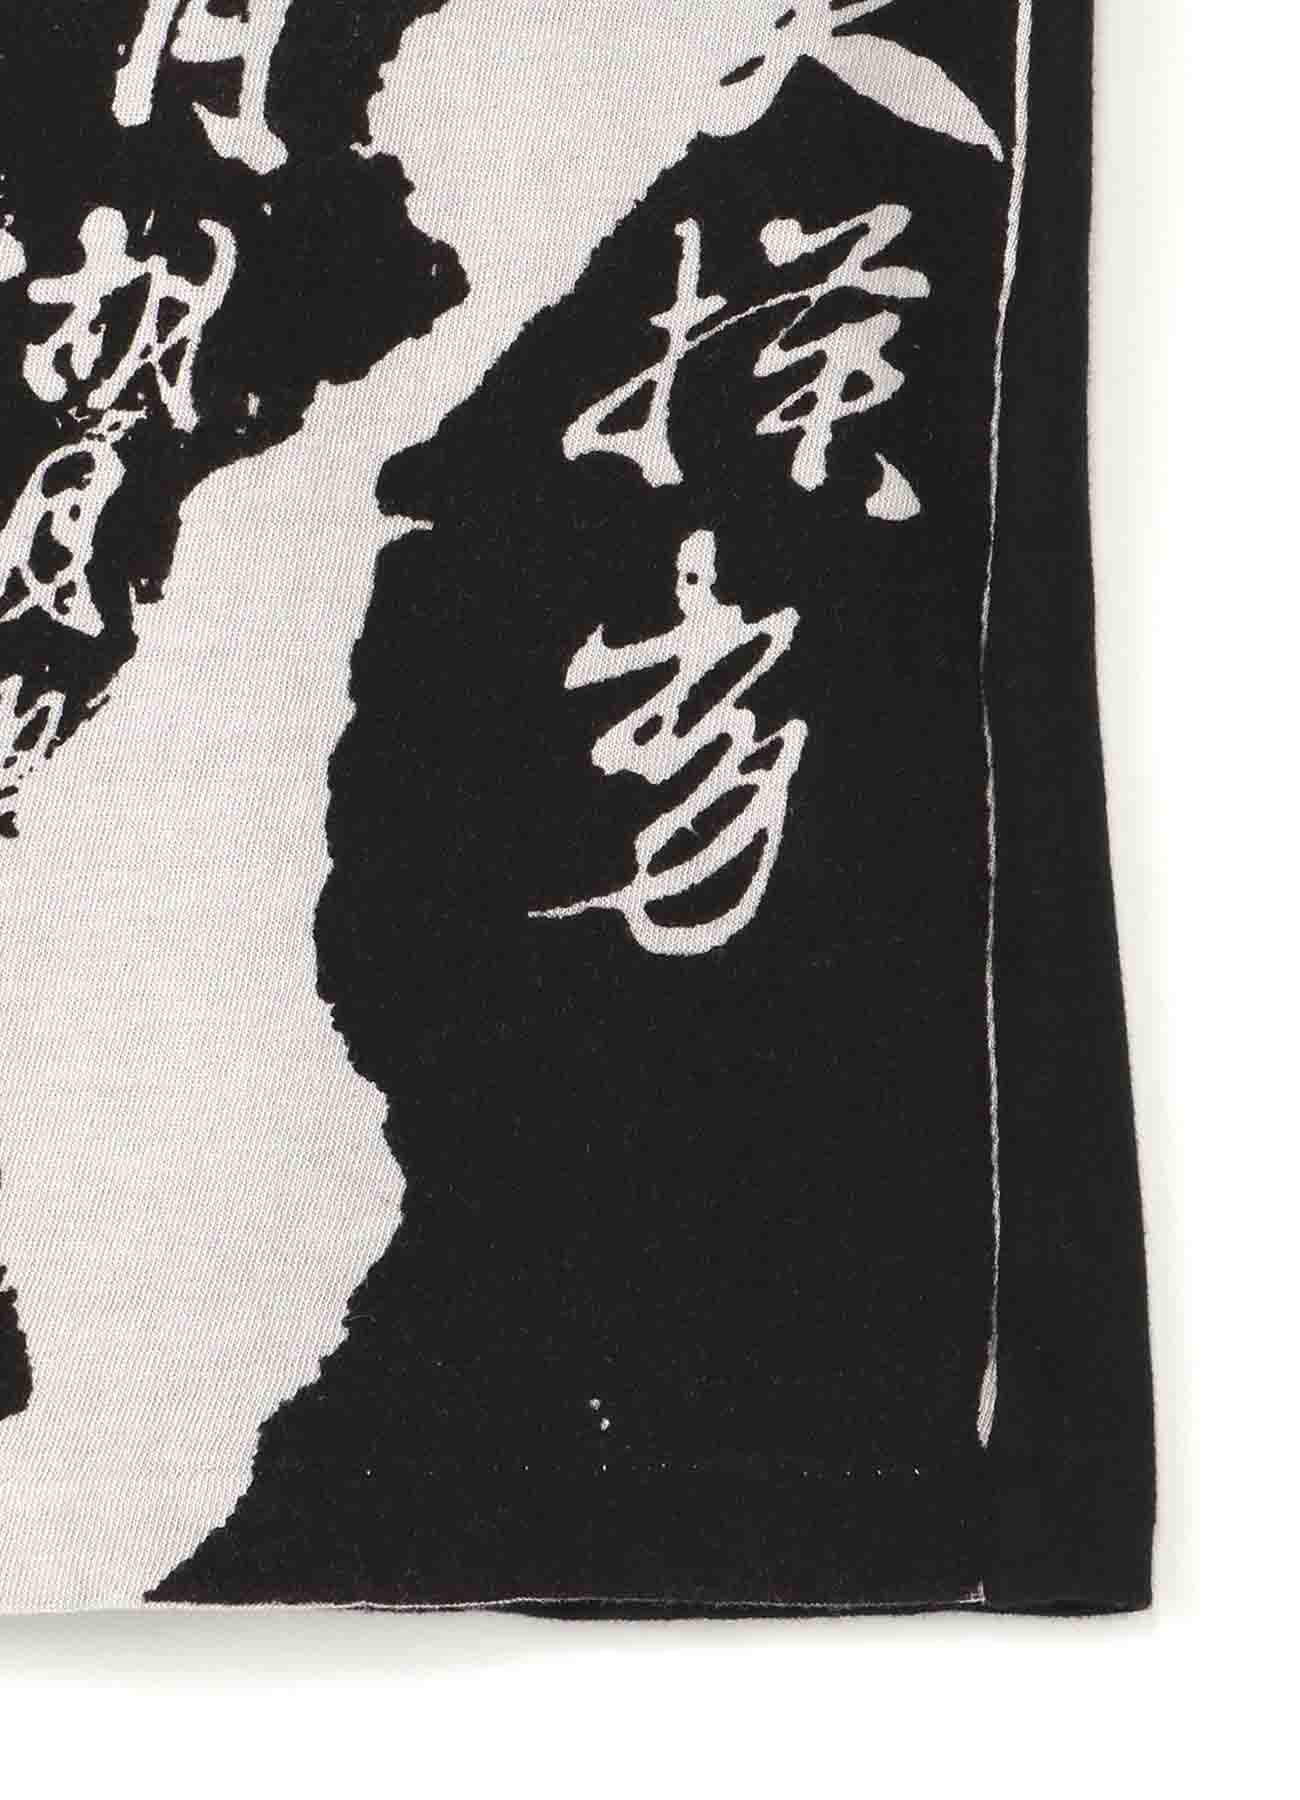 YARN DYE 16/- KANJI PRINT LAYER LONG SLEEVES